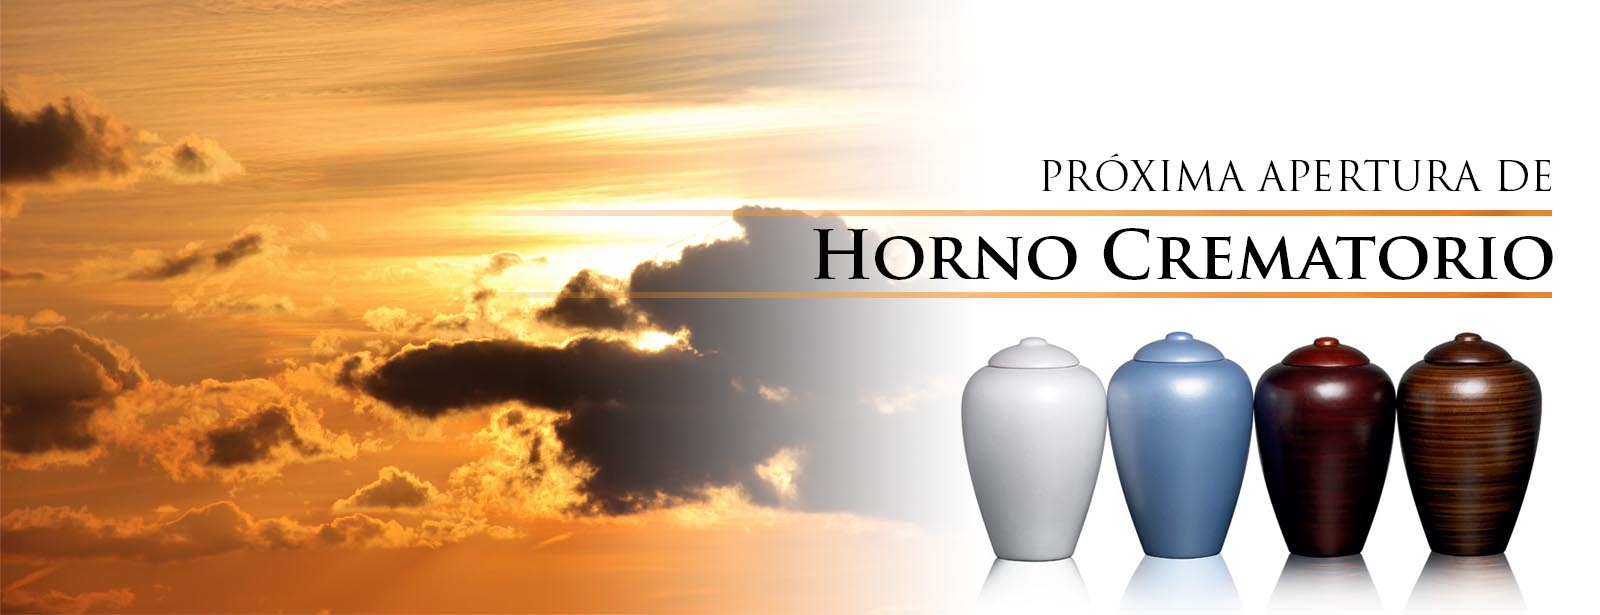 HORNO1.jpg